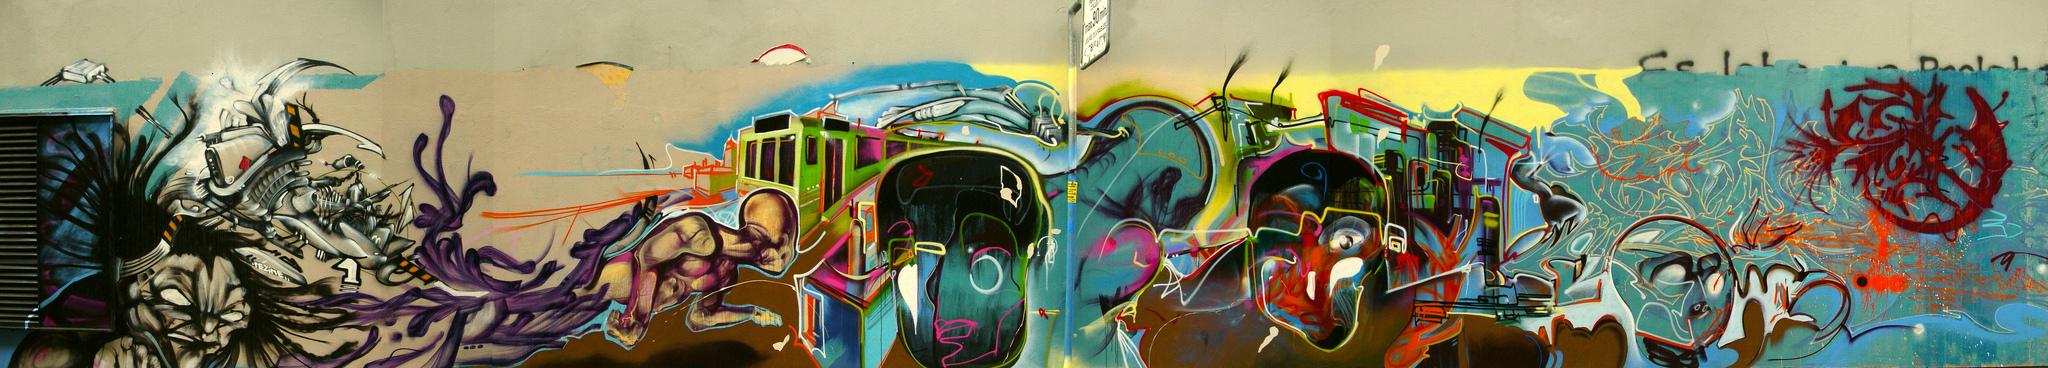 fresque murale horizontale gen ve nadib bandi graffiti mural. Black Bedroom Furniture Sets. Home Design Ideas